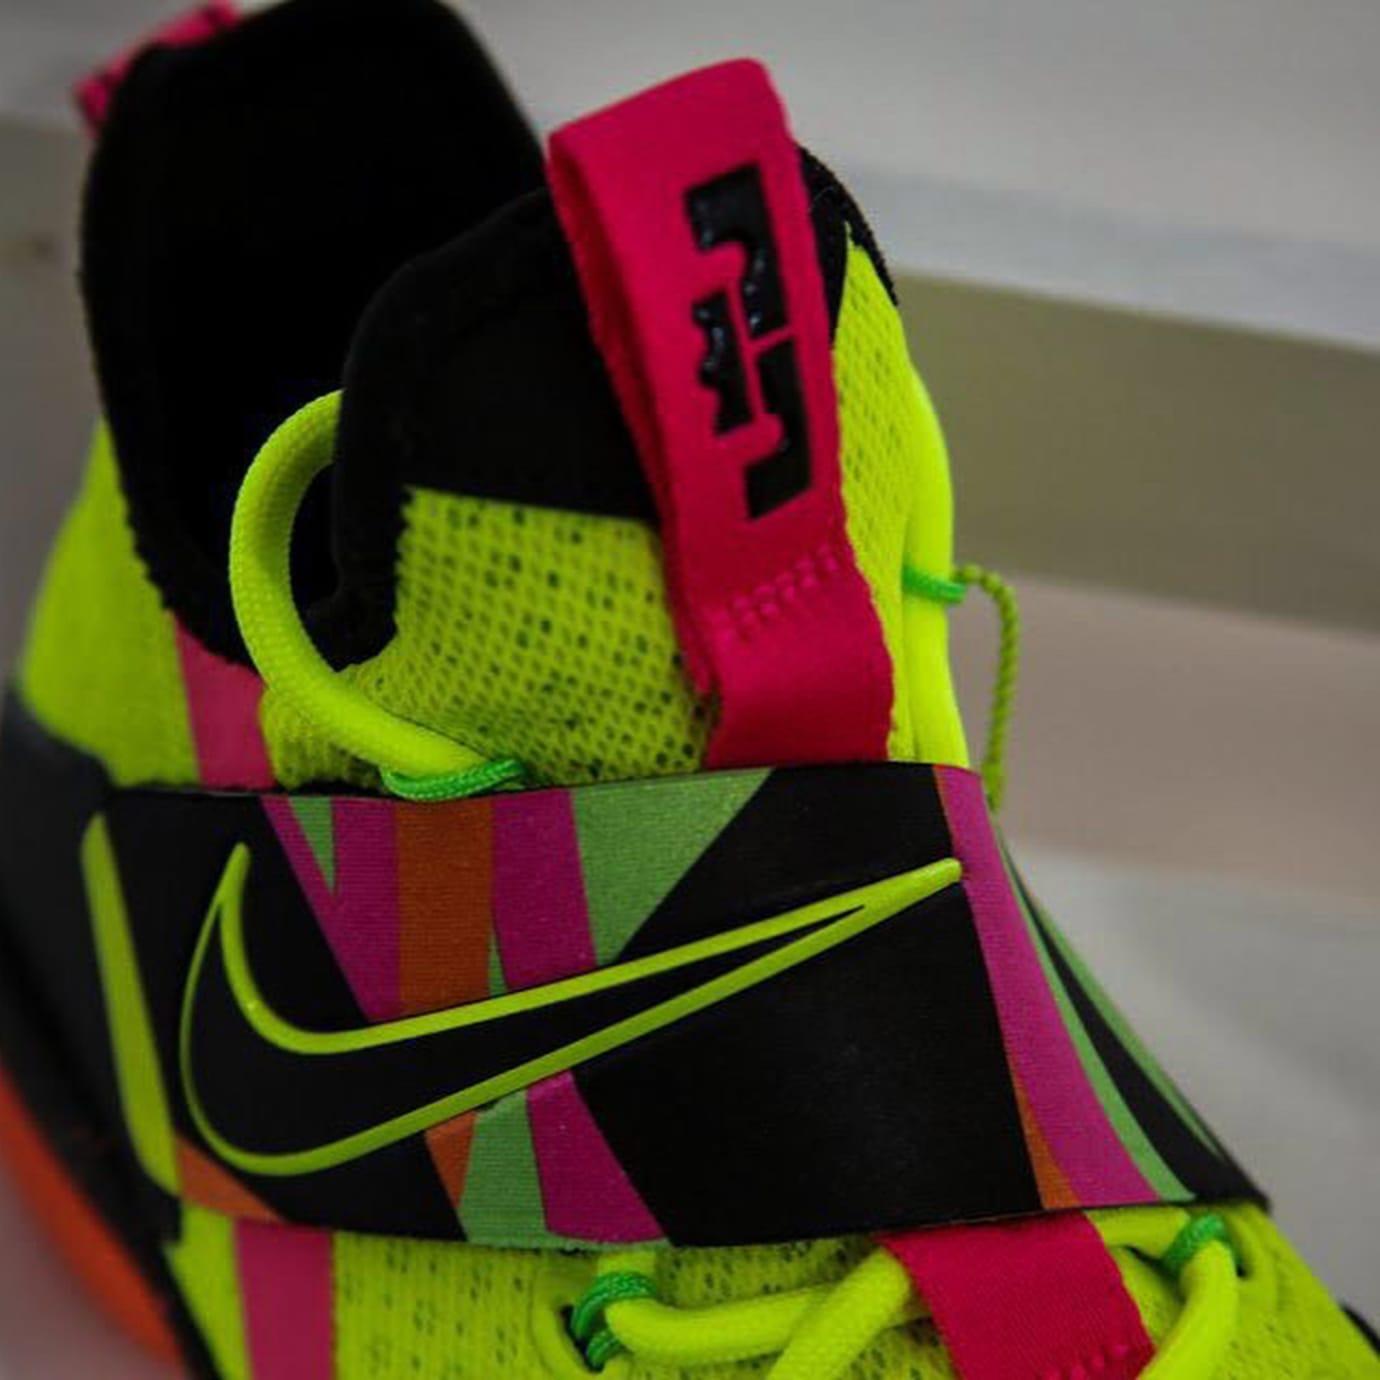 Nike LeBron 14 Ultimate Warrior Strap AA3258-703